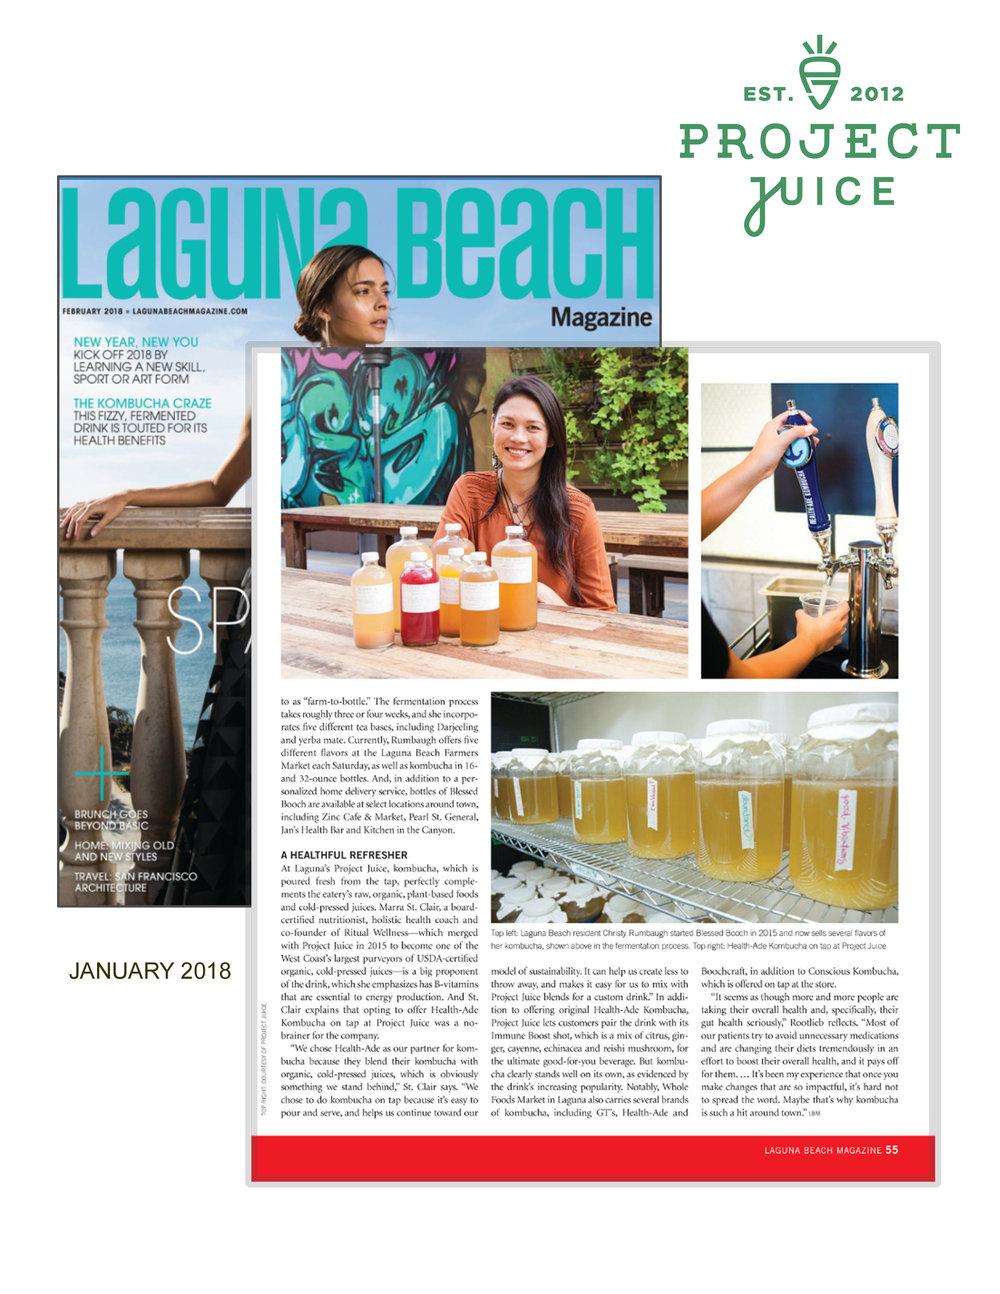 LagunaBeachMag_Jan2018.jpg